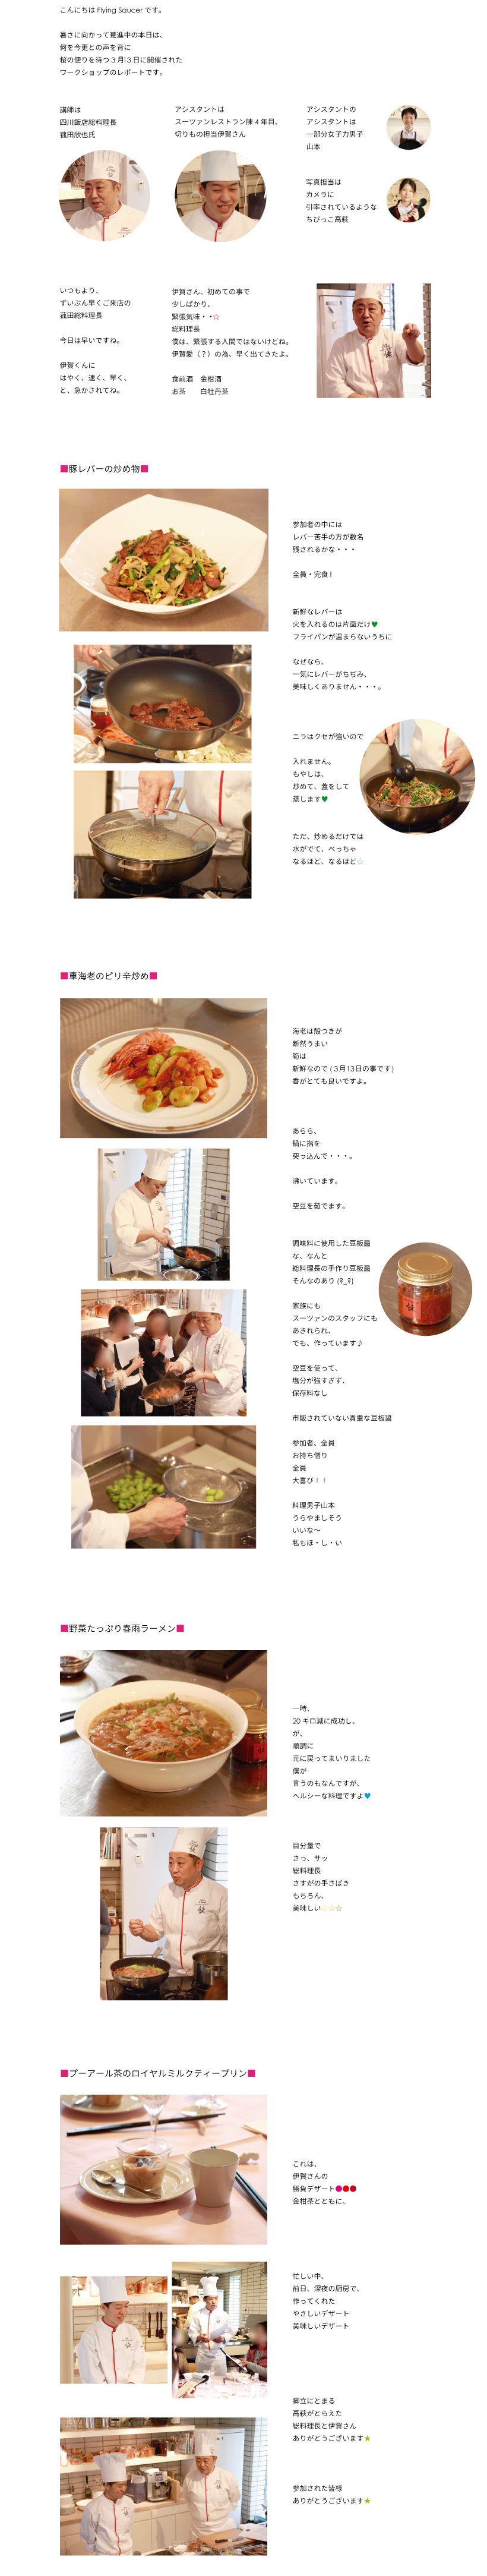 2016年3月13日(日)菰田WS